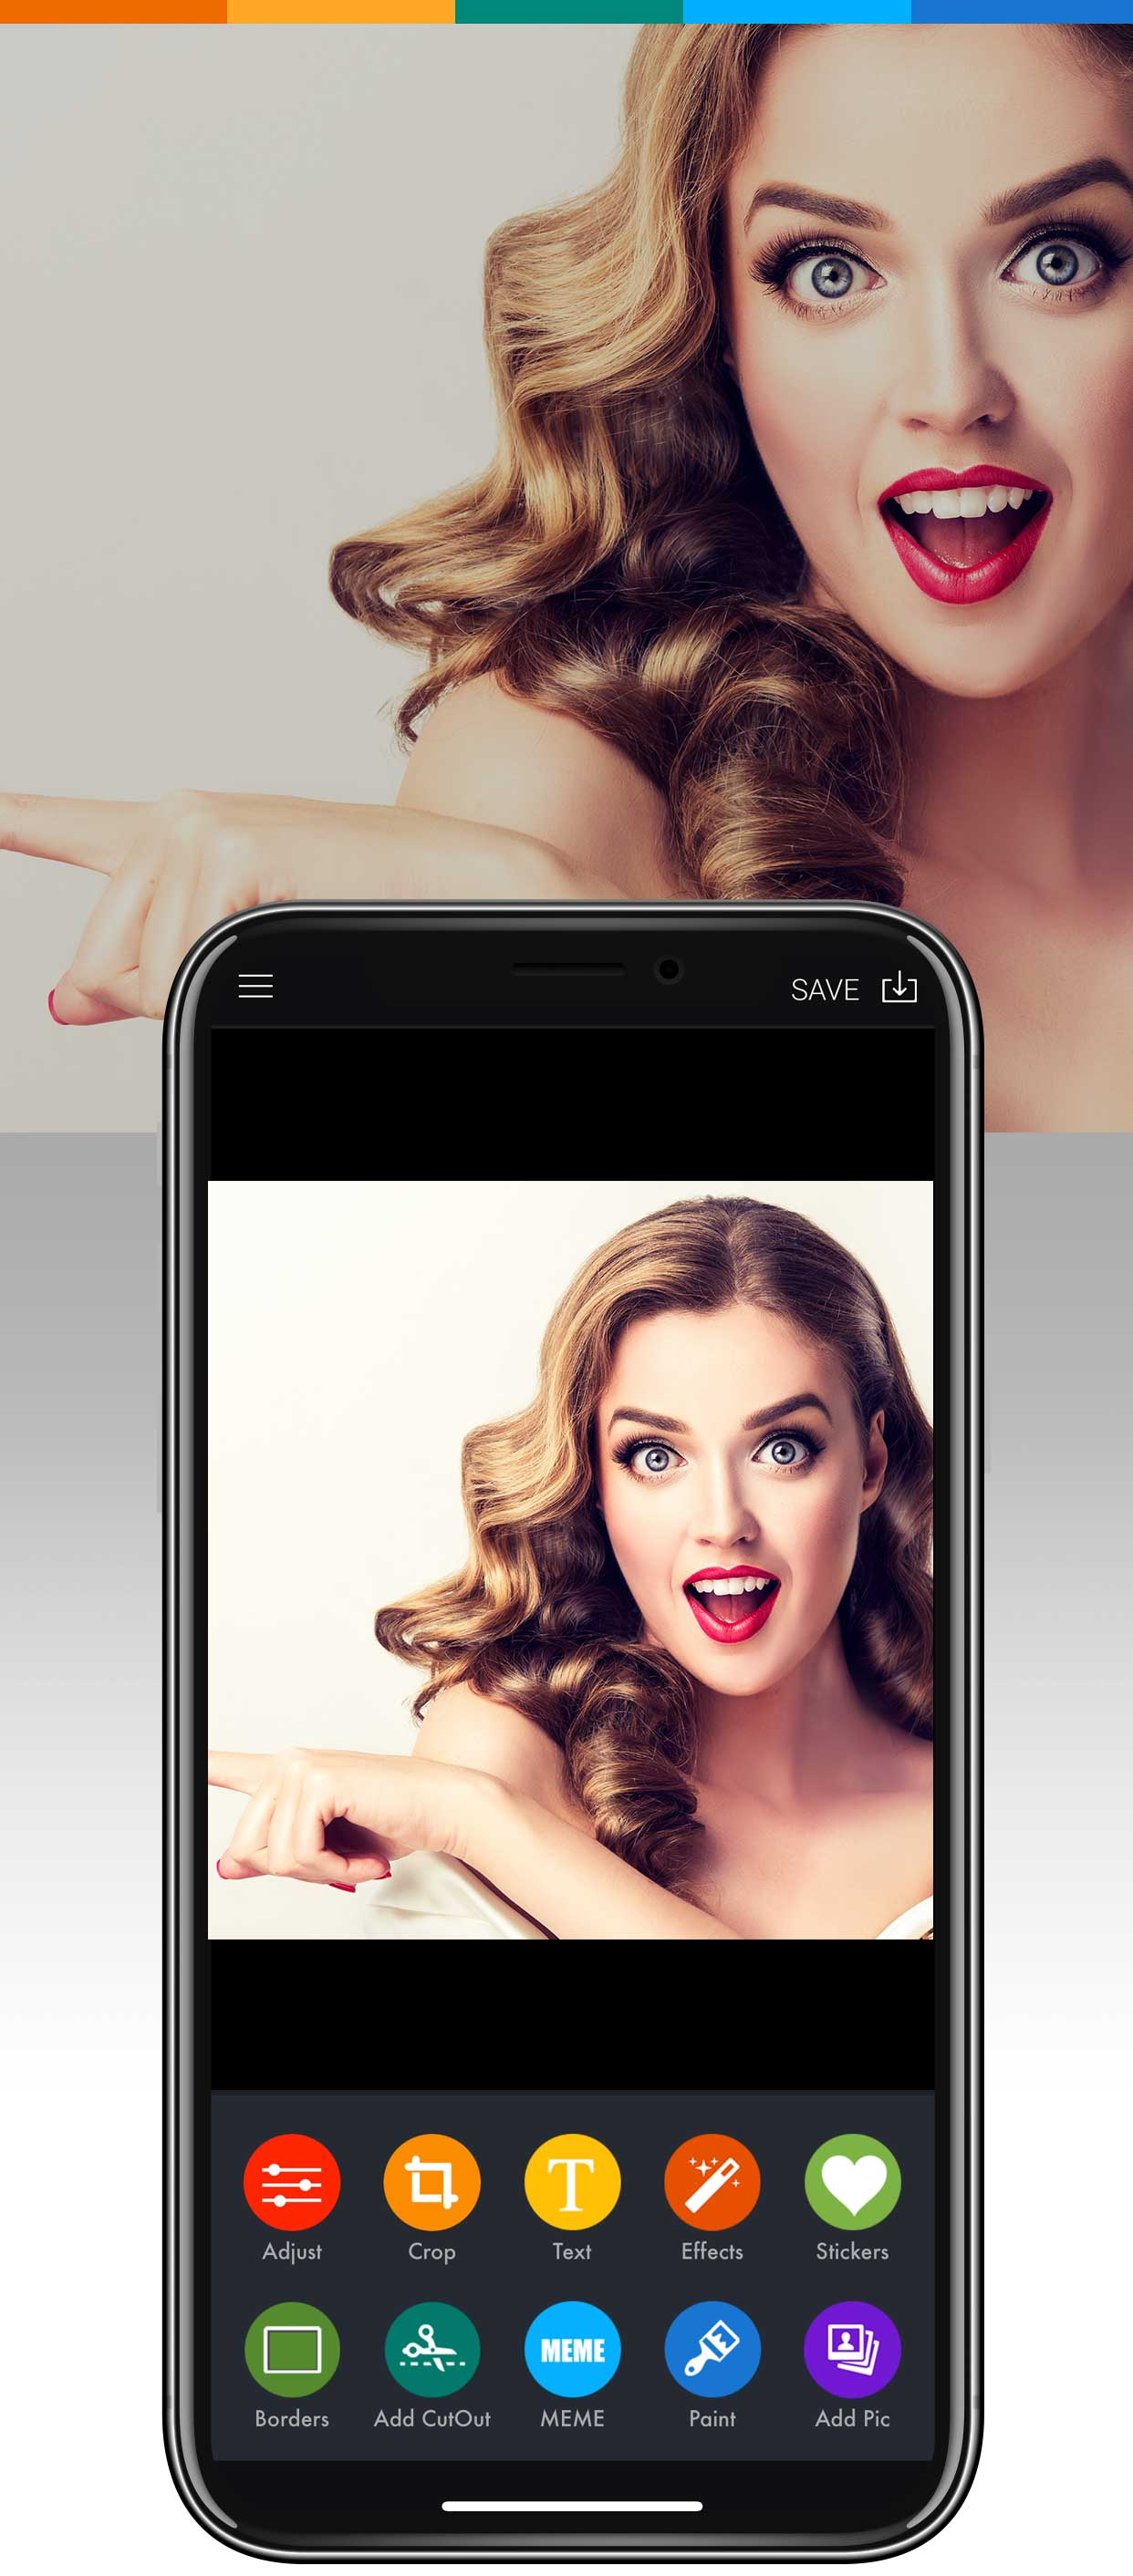 Airbrush Makeup App Touchup